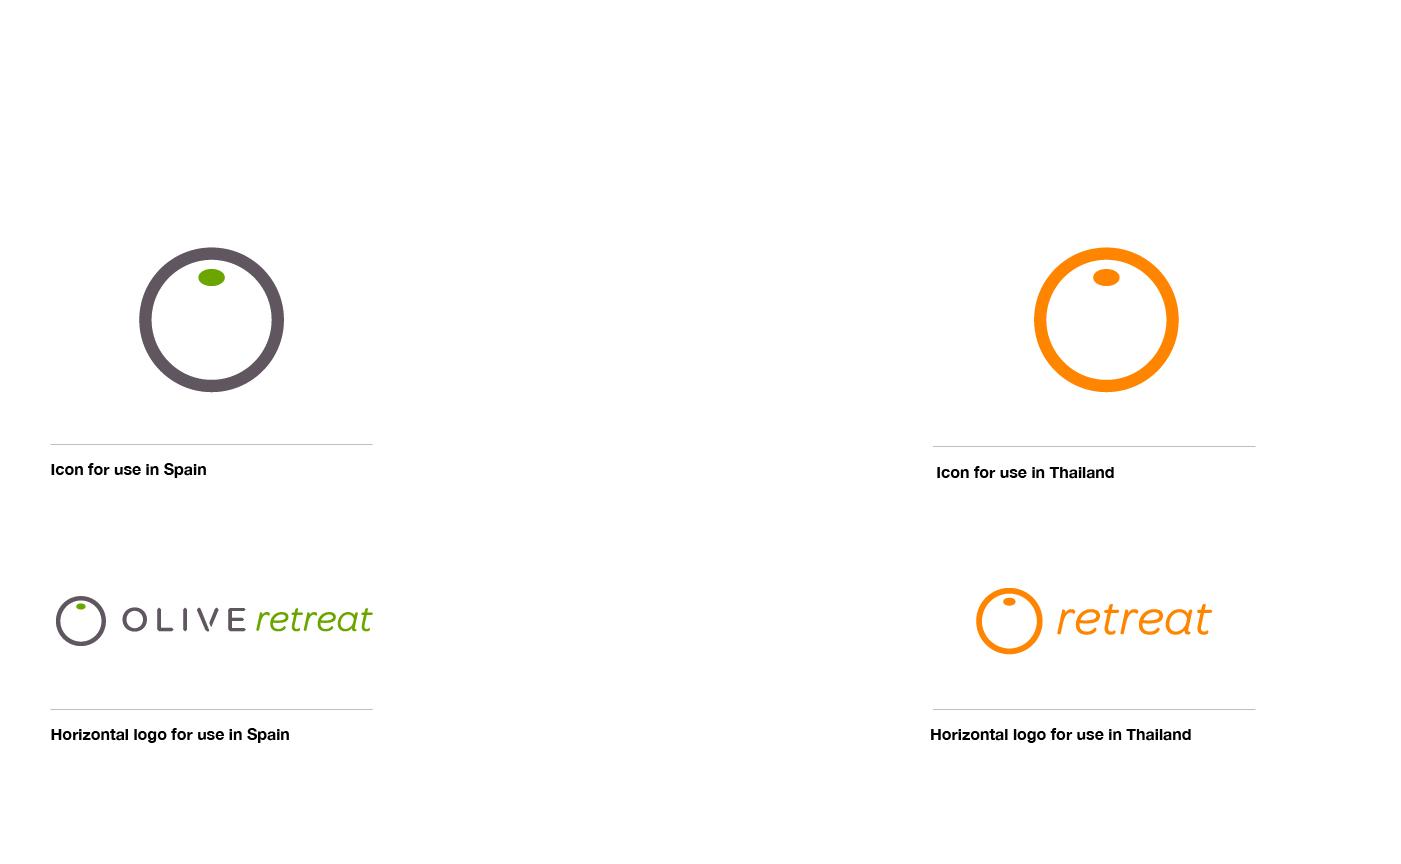 SOS Media Supporting Logo Design, Consulting, Branding for Retreats